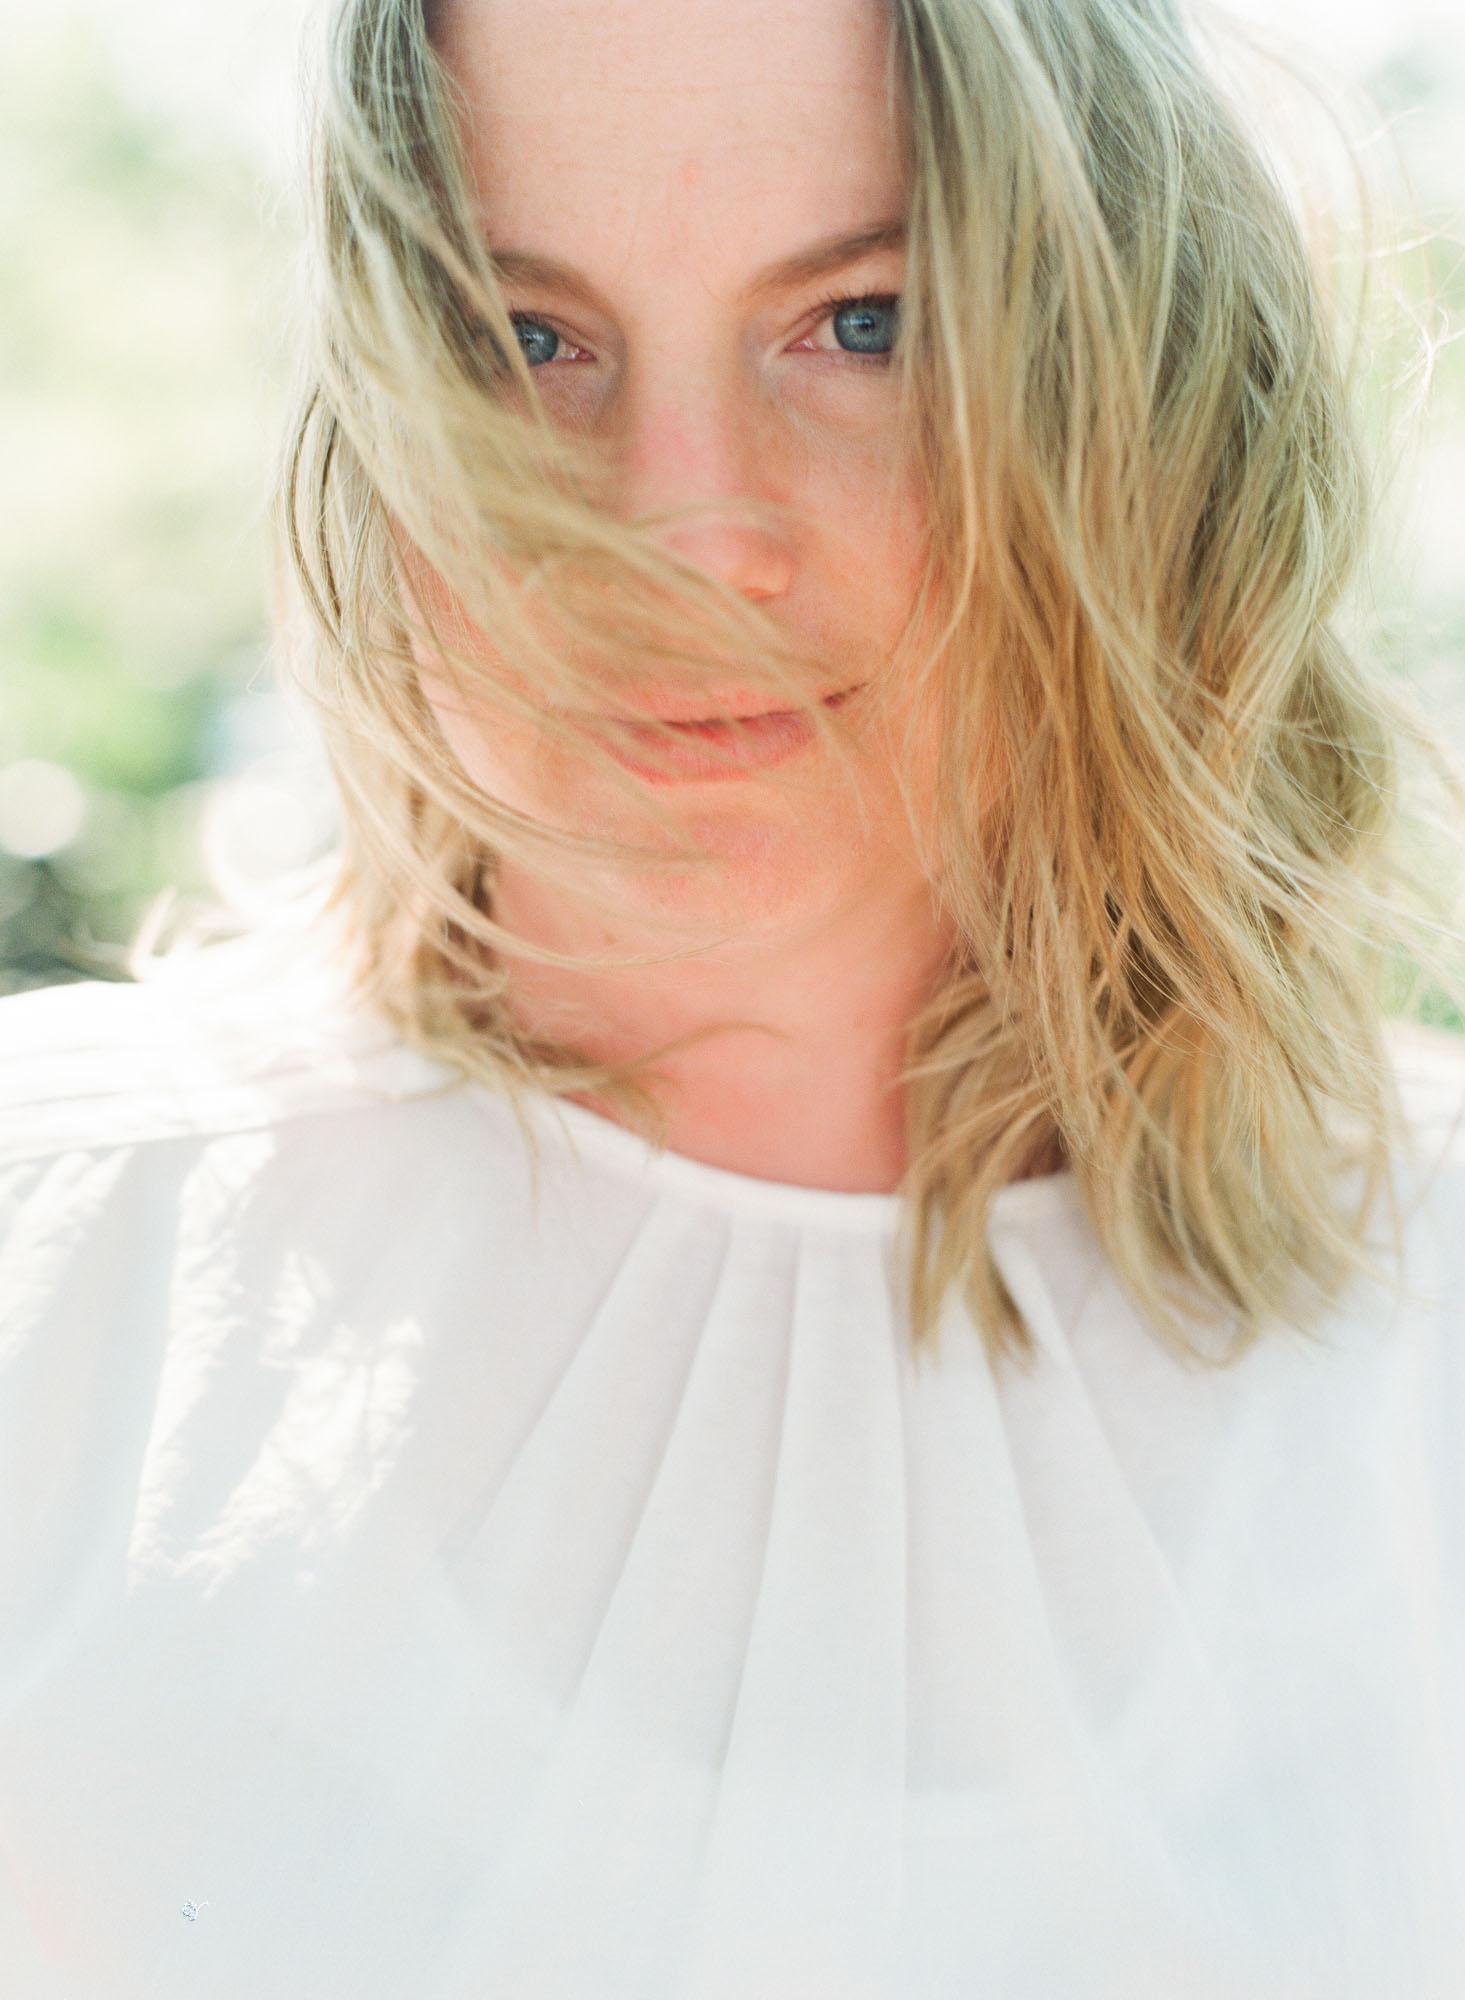 raleigh-film-portrait-photographer-004